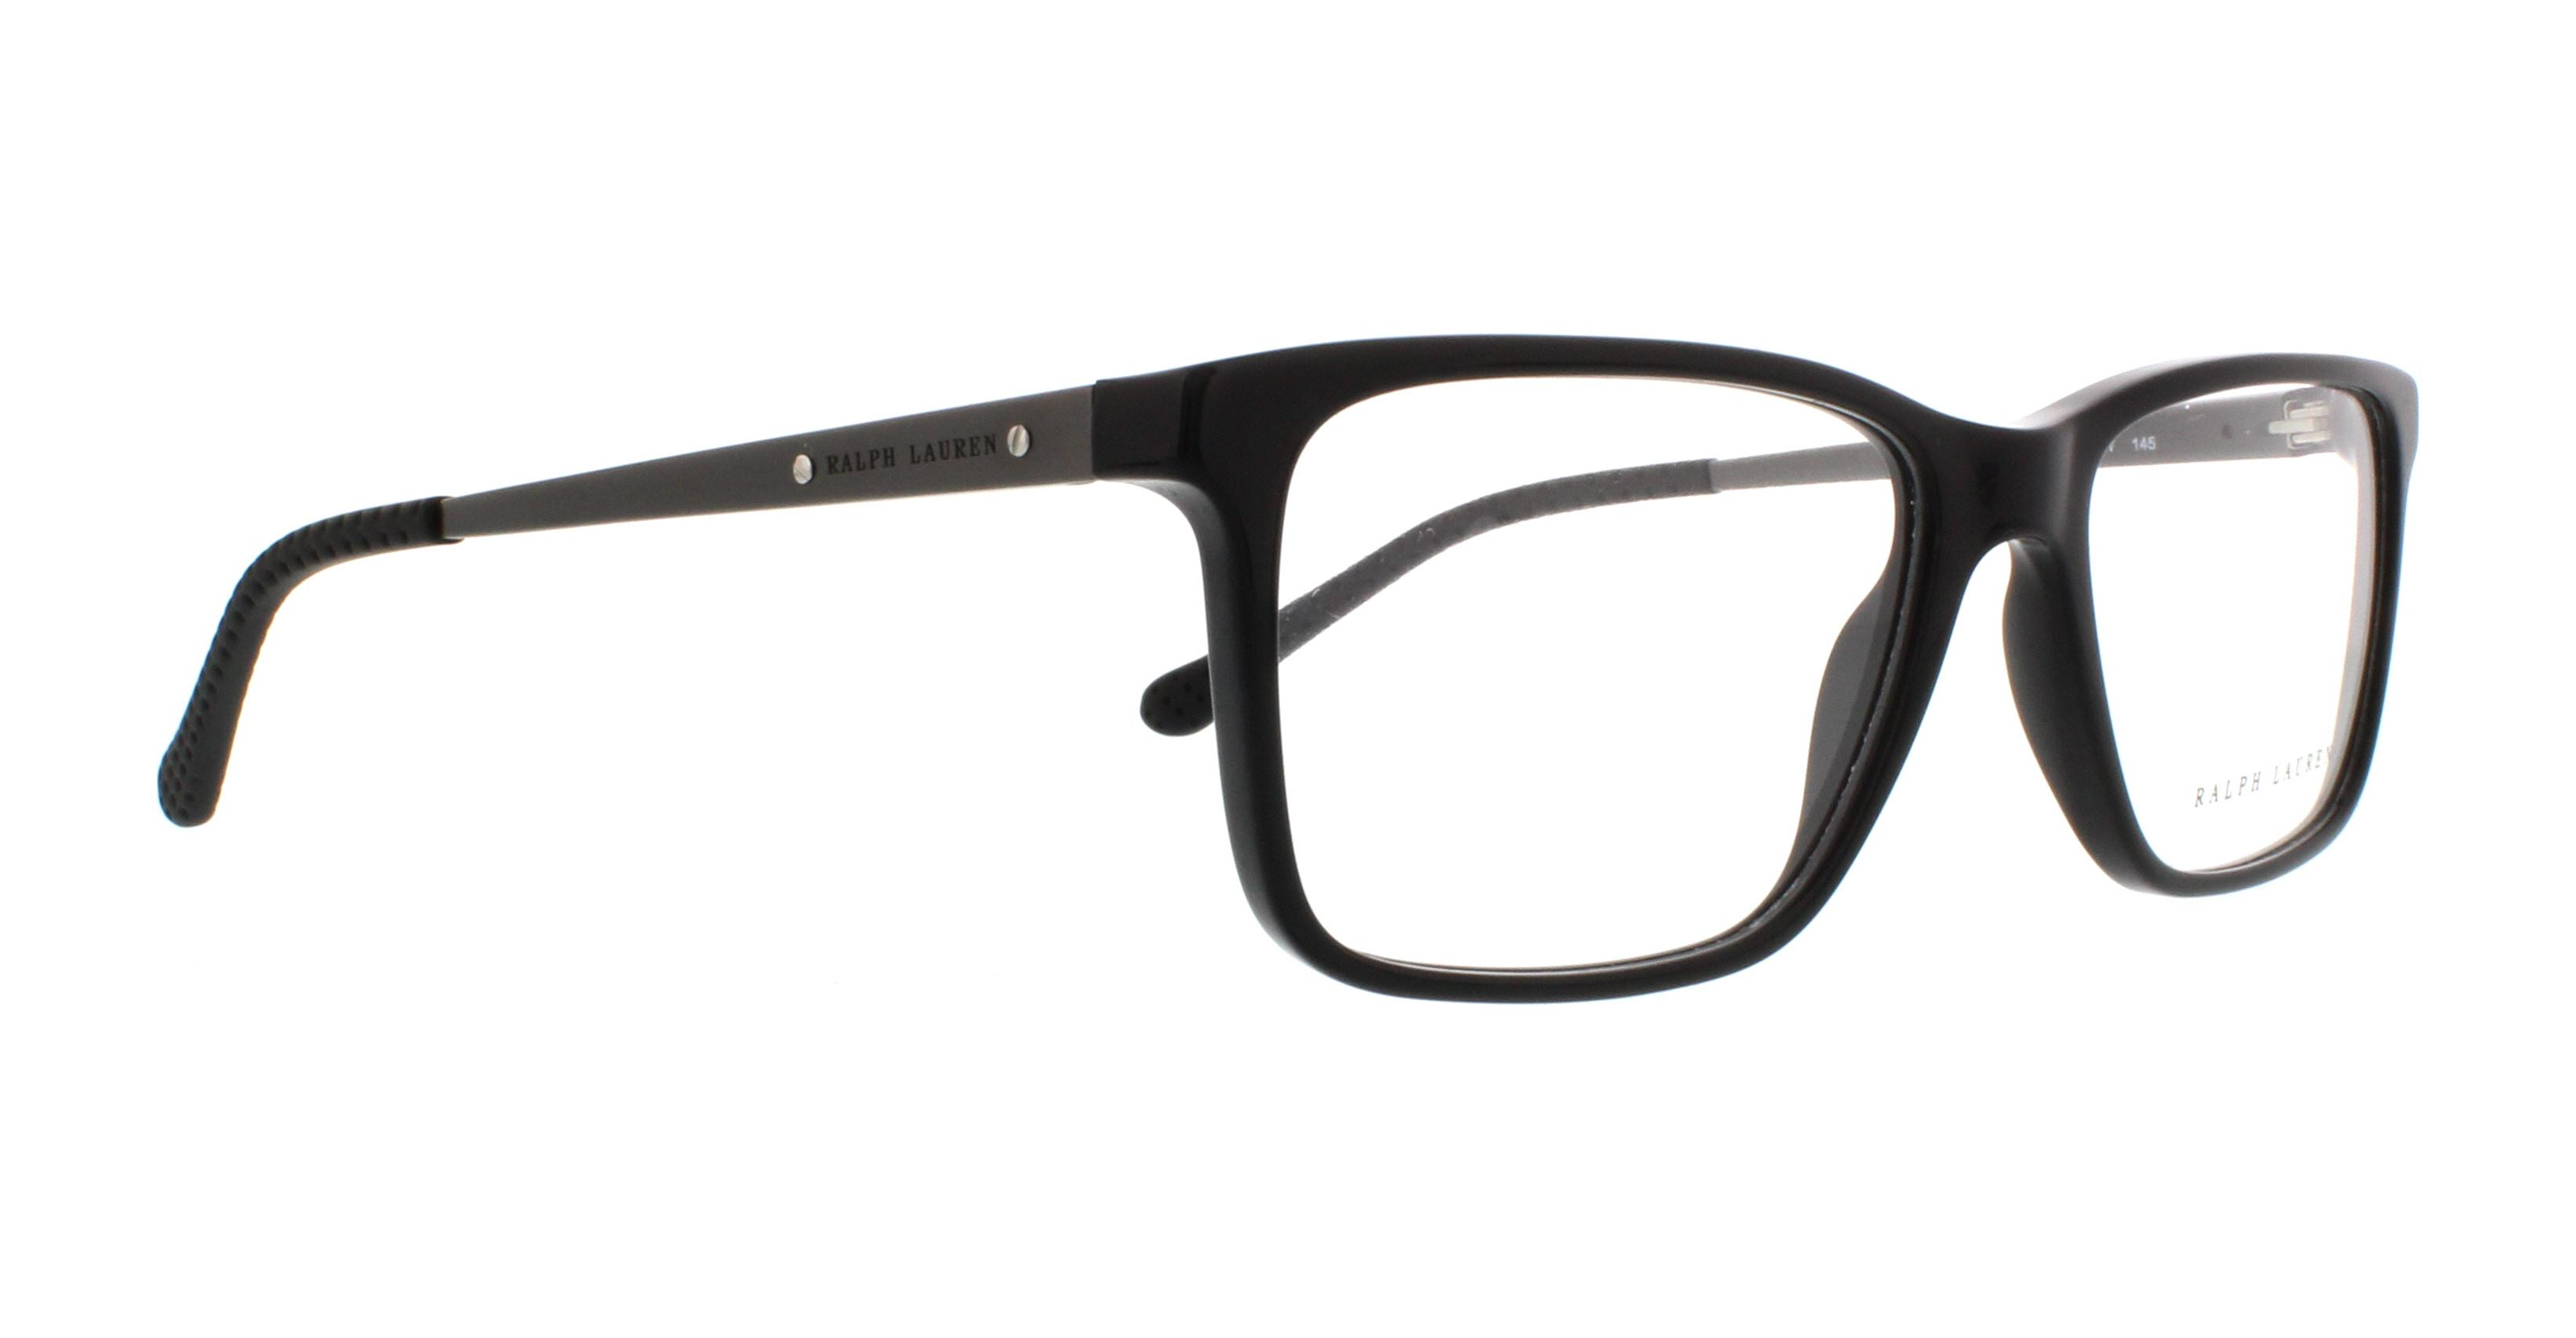 541853e7f54 Designer frames outlet ralph lauren jpg 3284x1706 Dark havana rl6133 ralph  lauren eyeglass